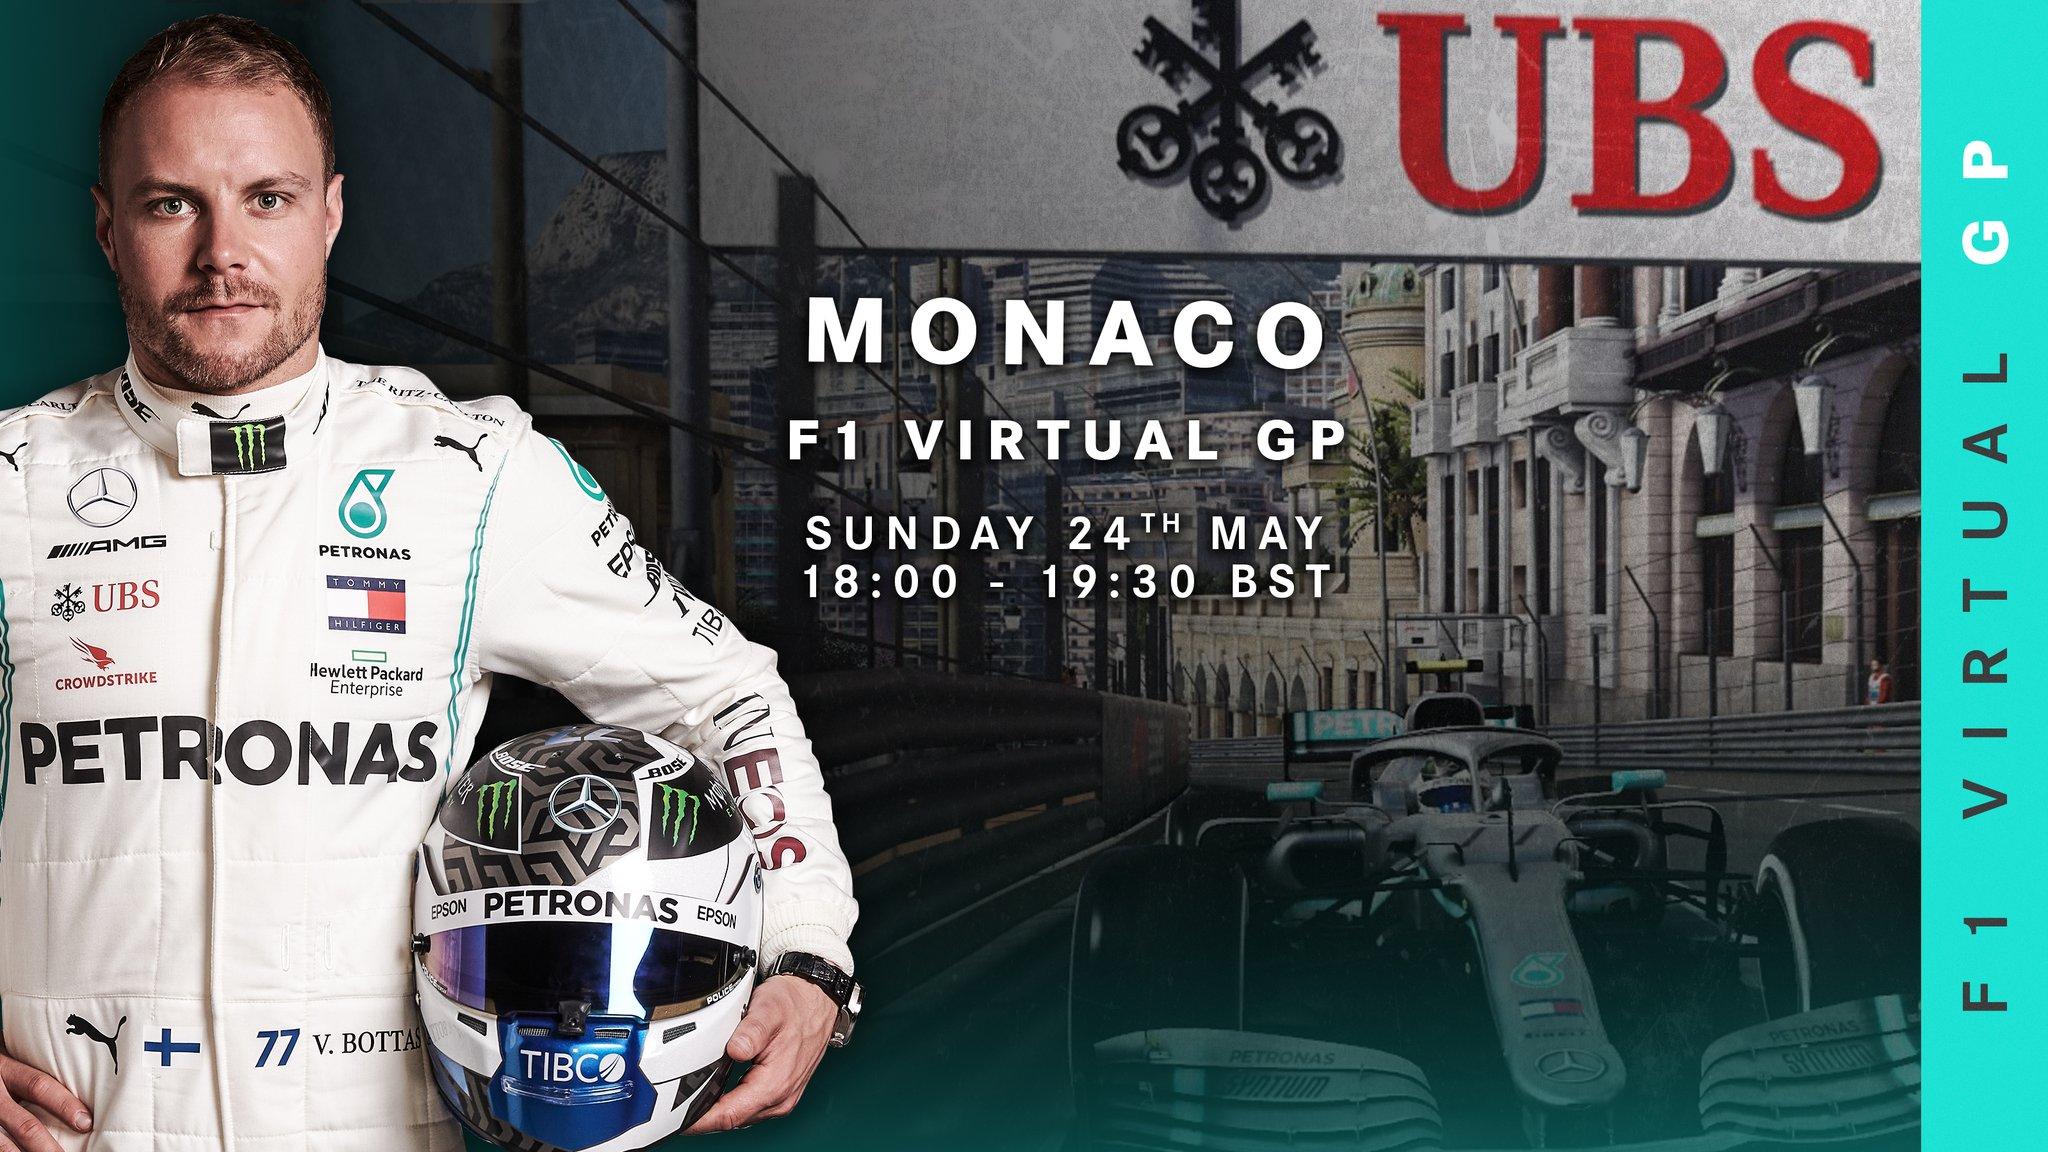 Bottas et Ocon se joignent au Grand Prix virtuel de Monaco